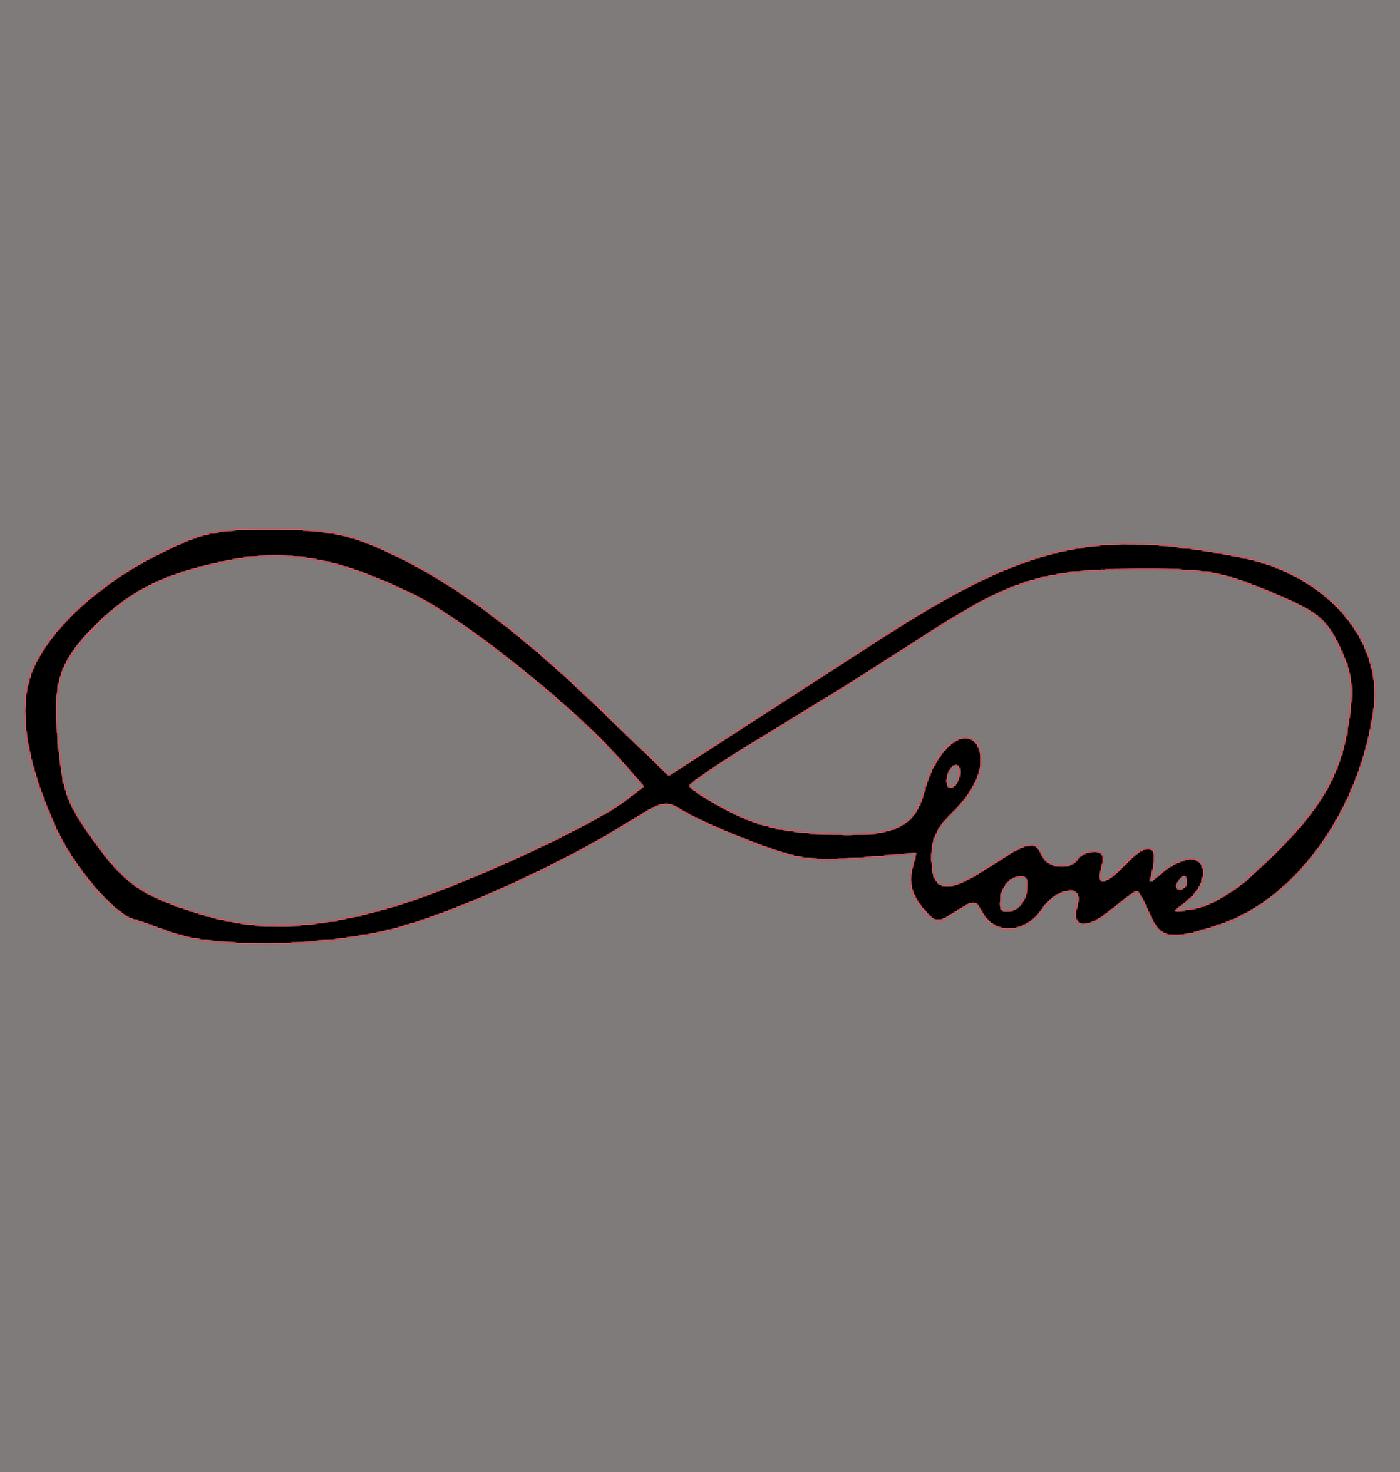 infinity_2Blove_original